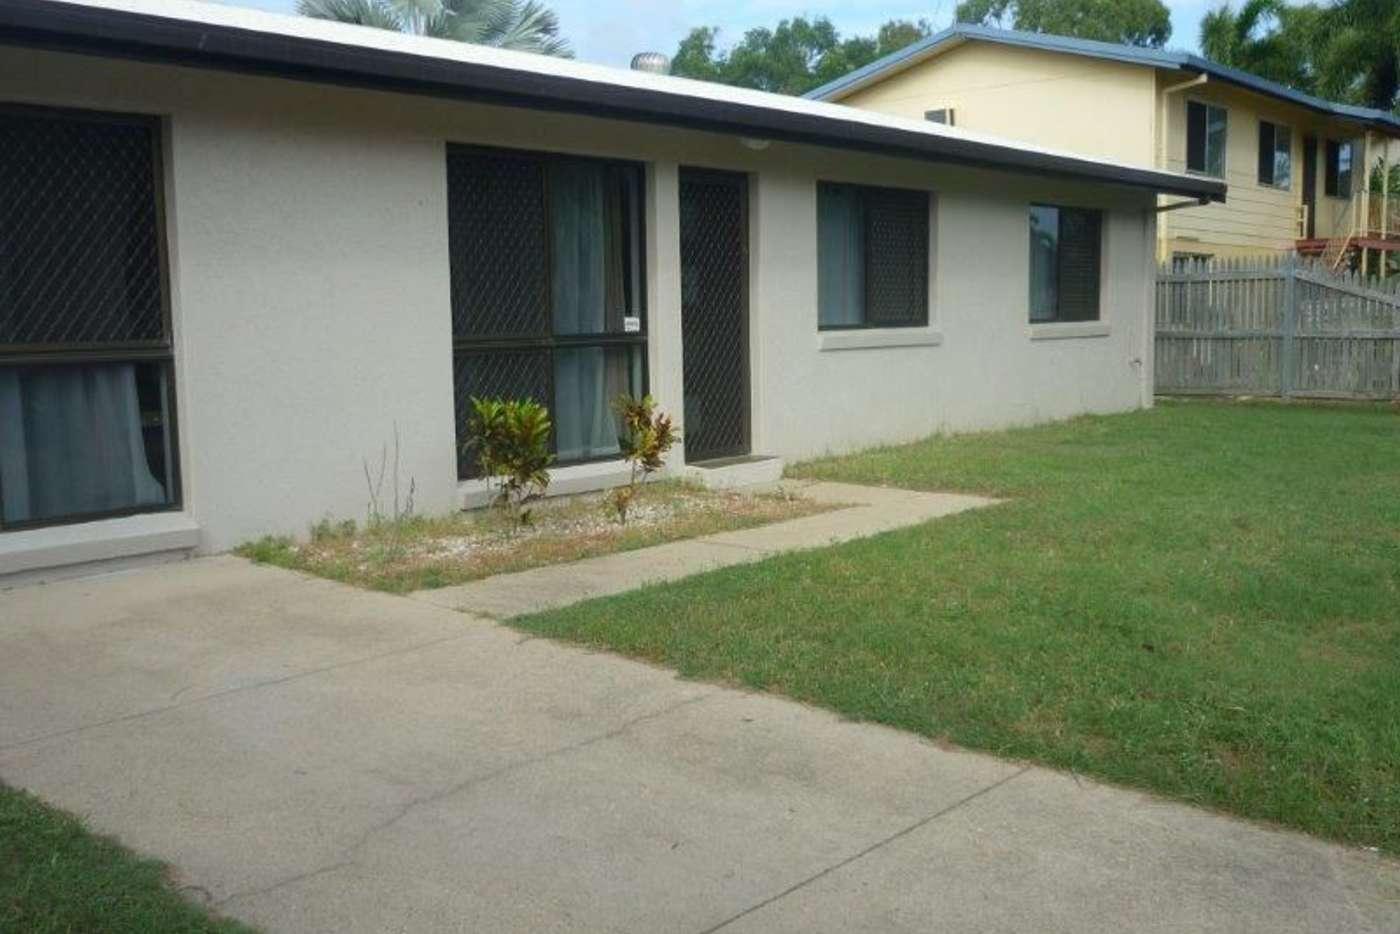 Main view of Homely house listing, 5 Pepperwood Street, Deeragun QLD 4818